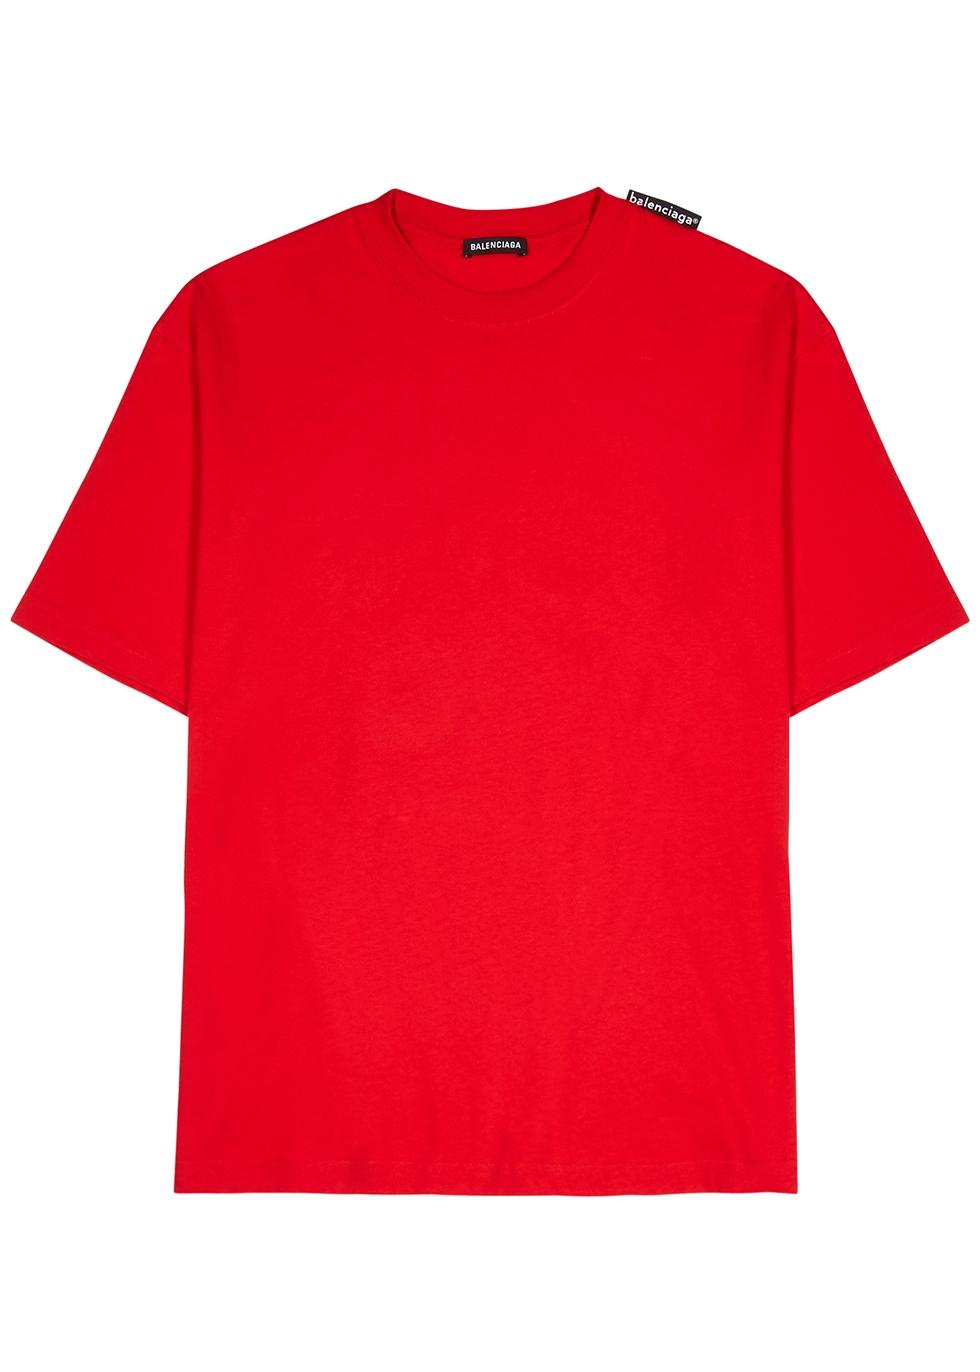 Red cotton T-shirt - Harvey Nichols